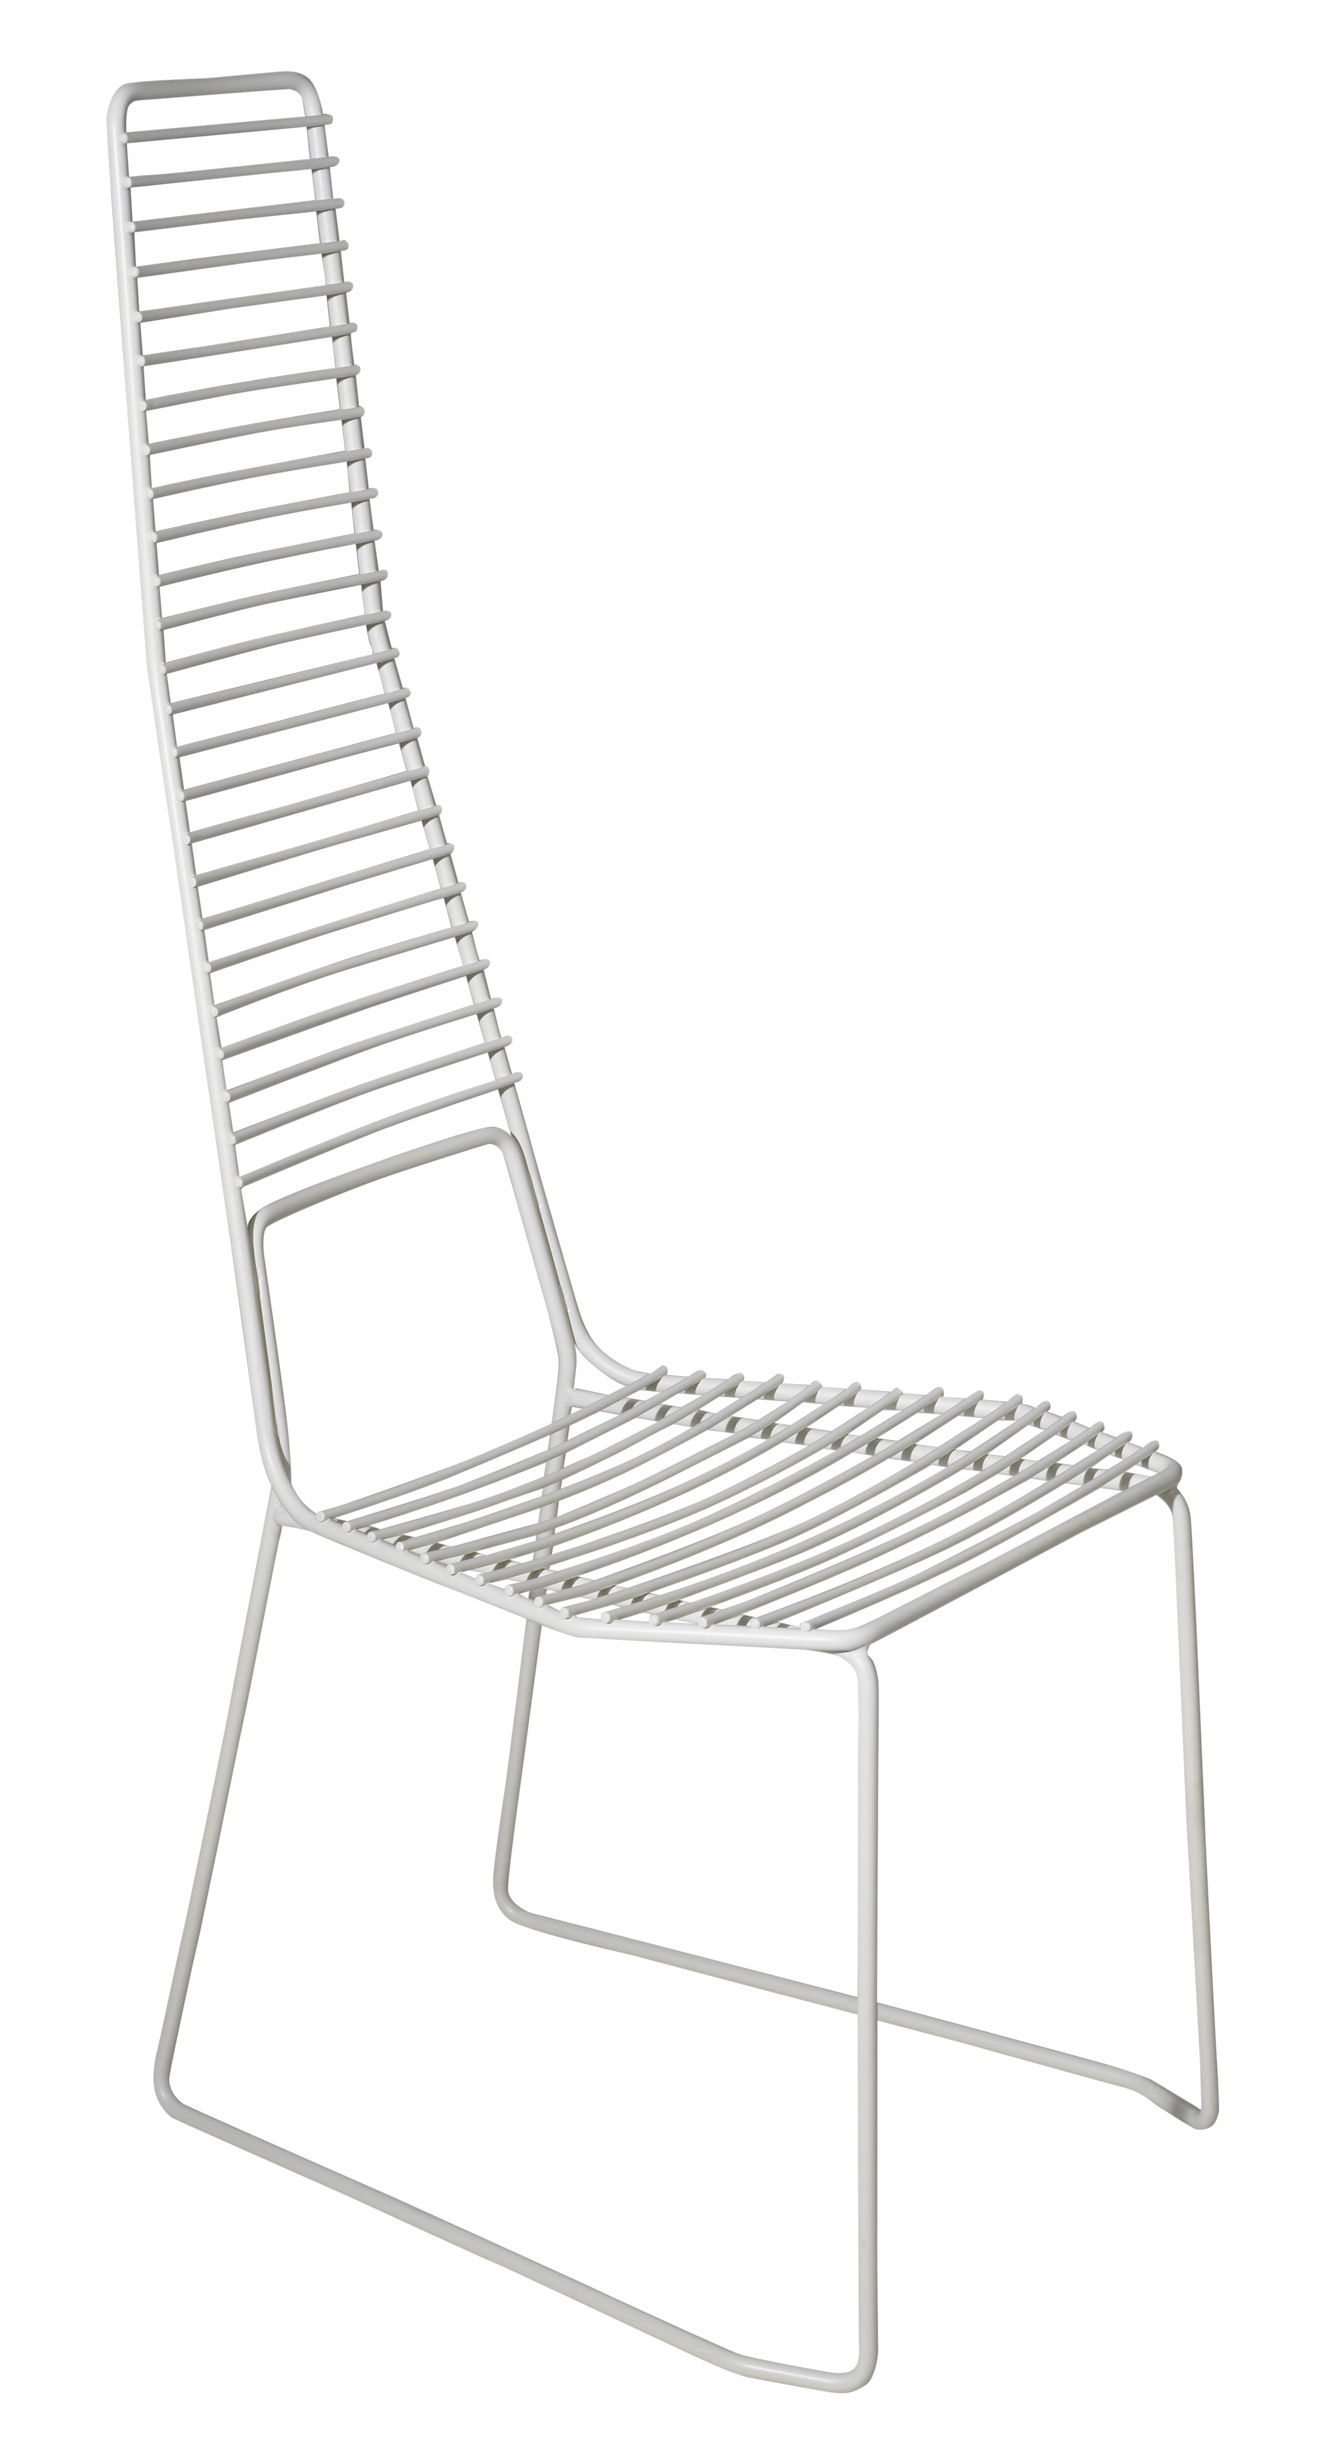 Möbel - Stühle  - Alieno Stuhl - Casamania - Weiß - lackiertes Metall